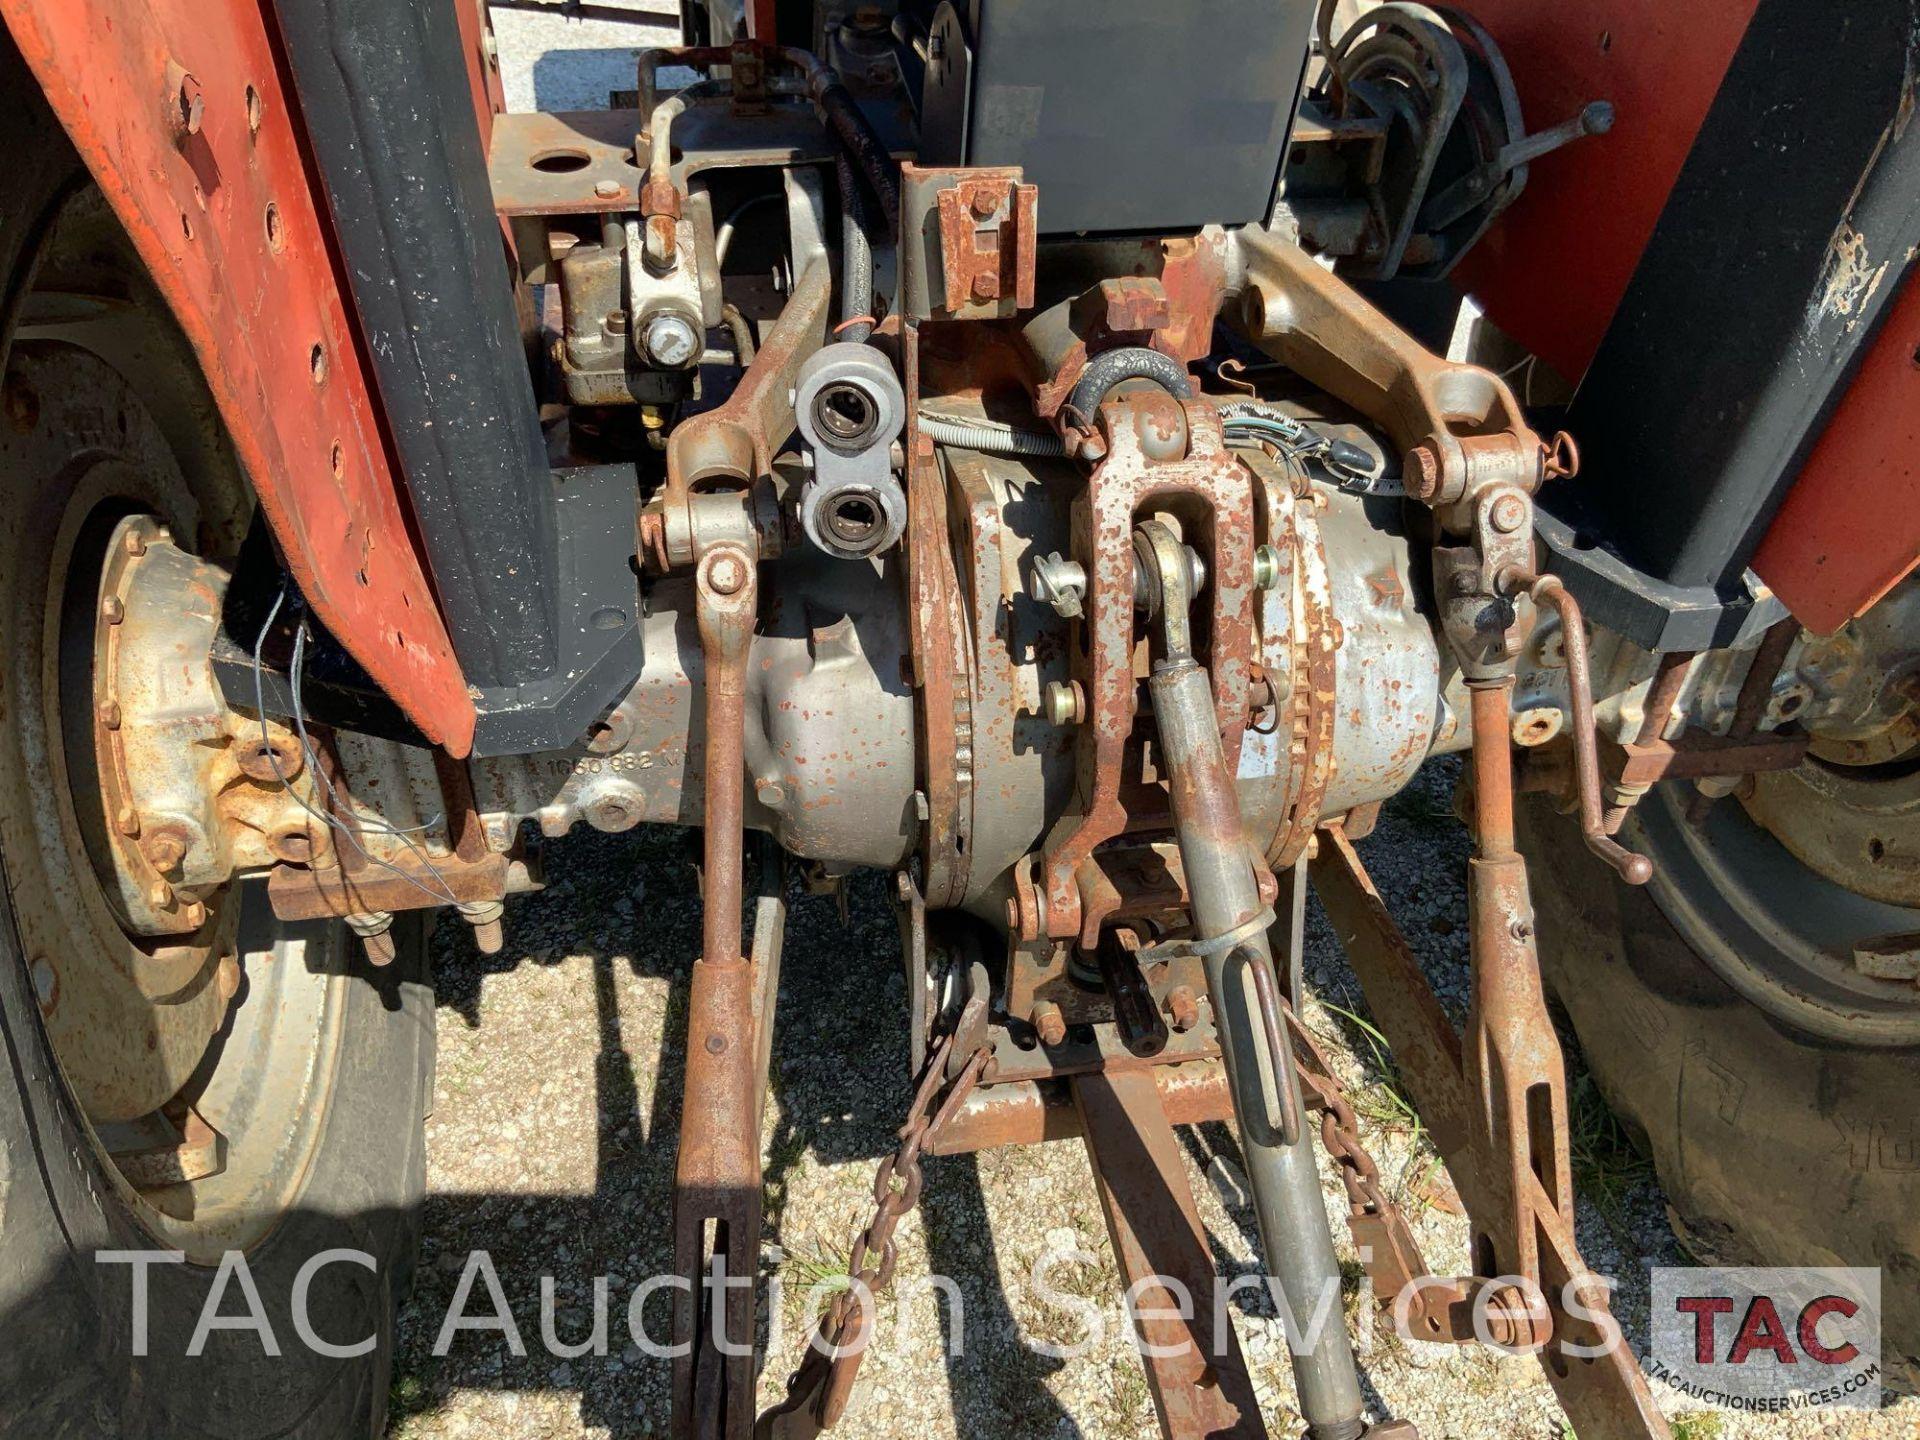 Massey Ferguson 265 FarmTractor - Image 15 of 23